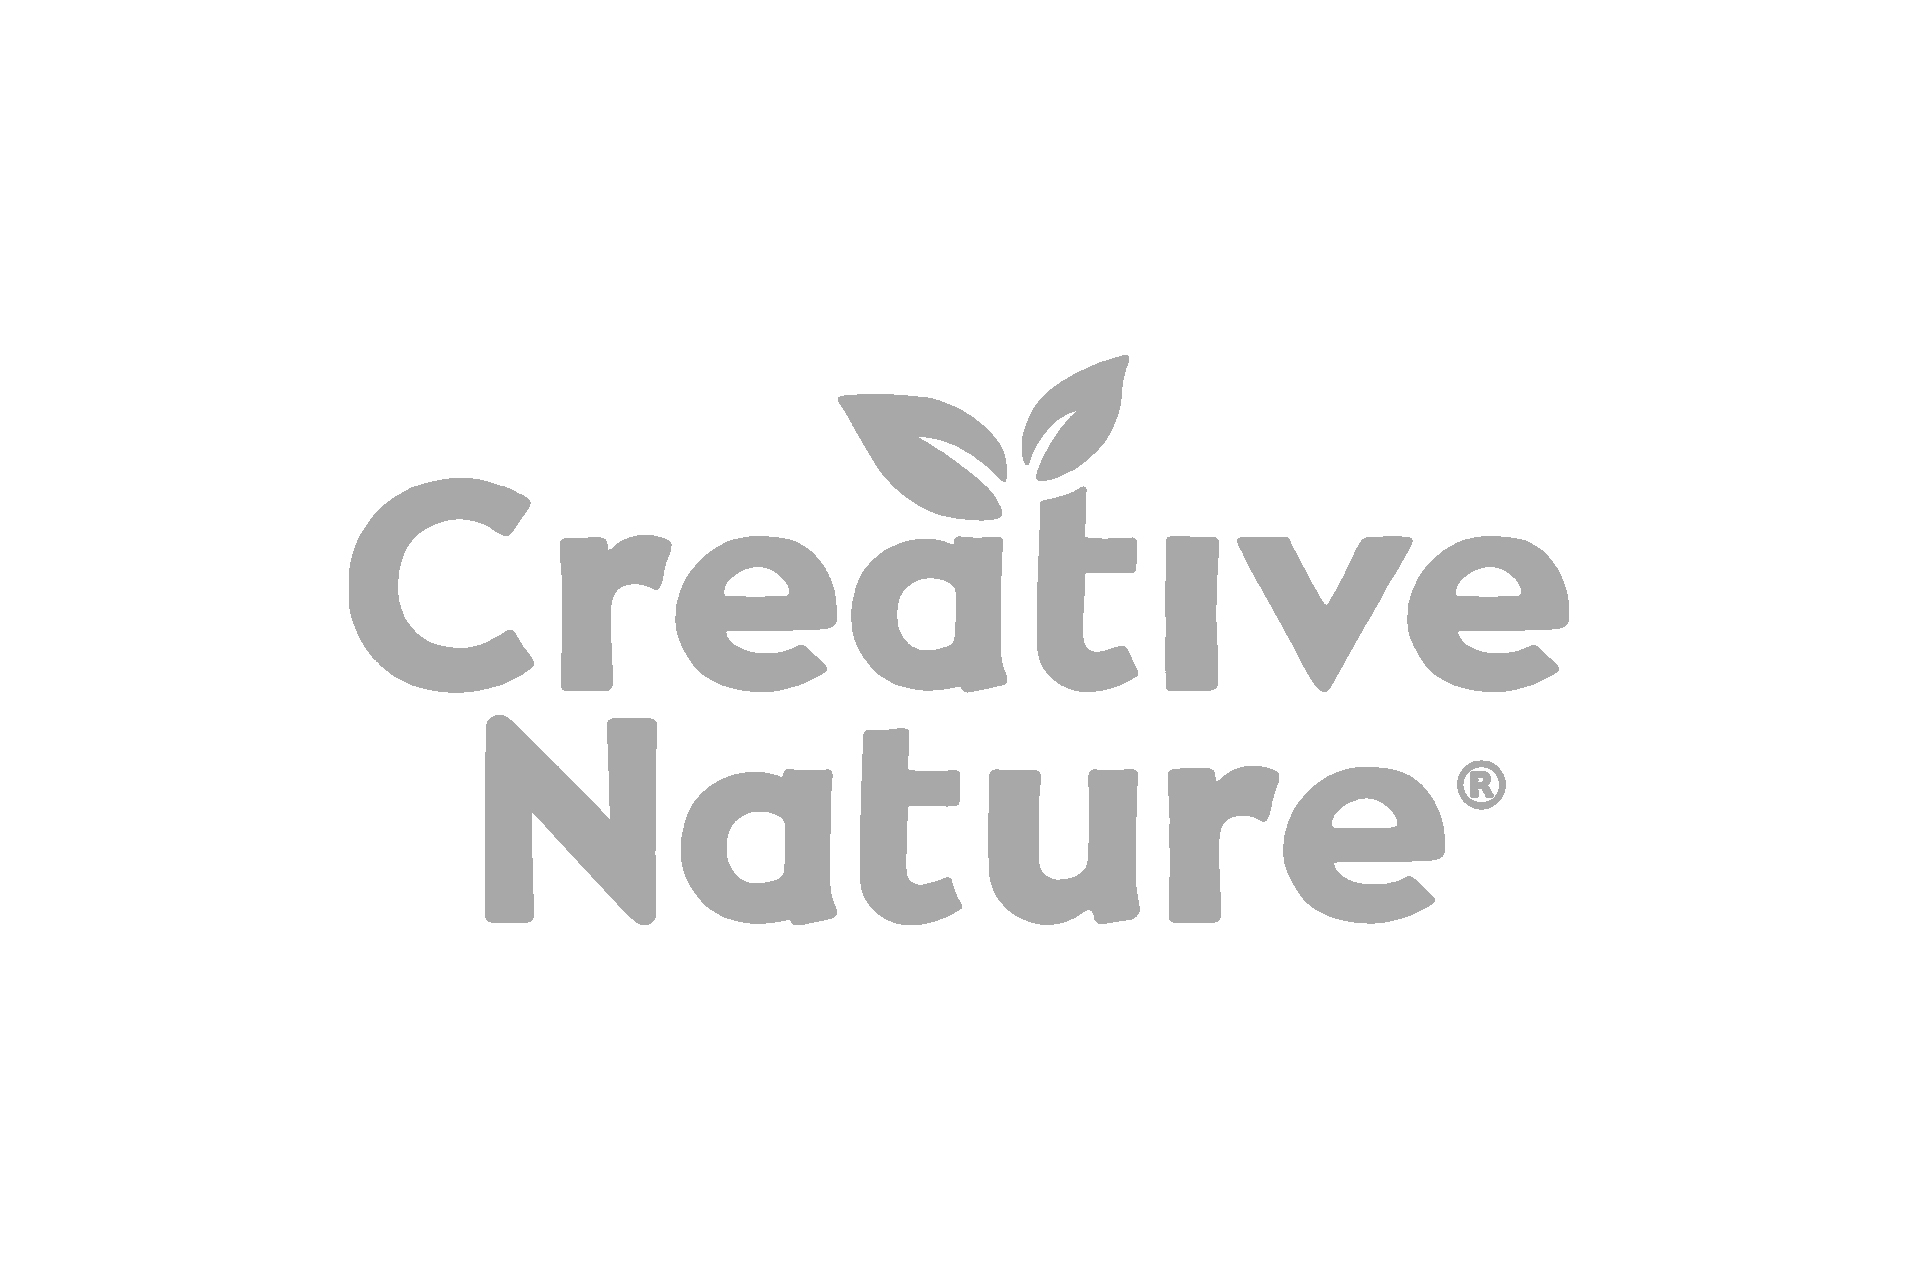 creative nature logo grey